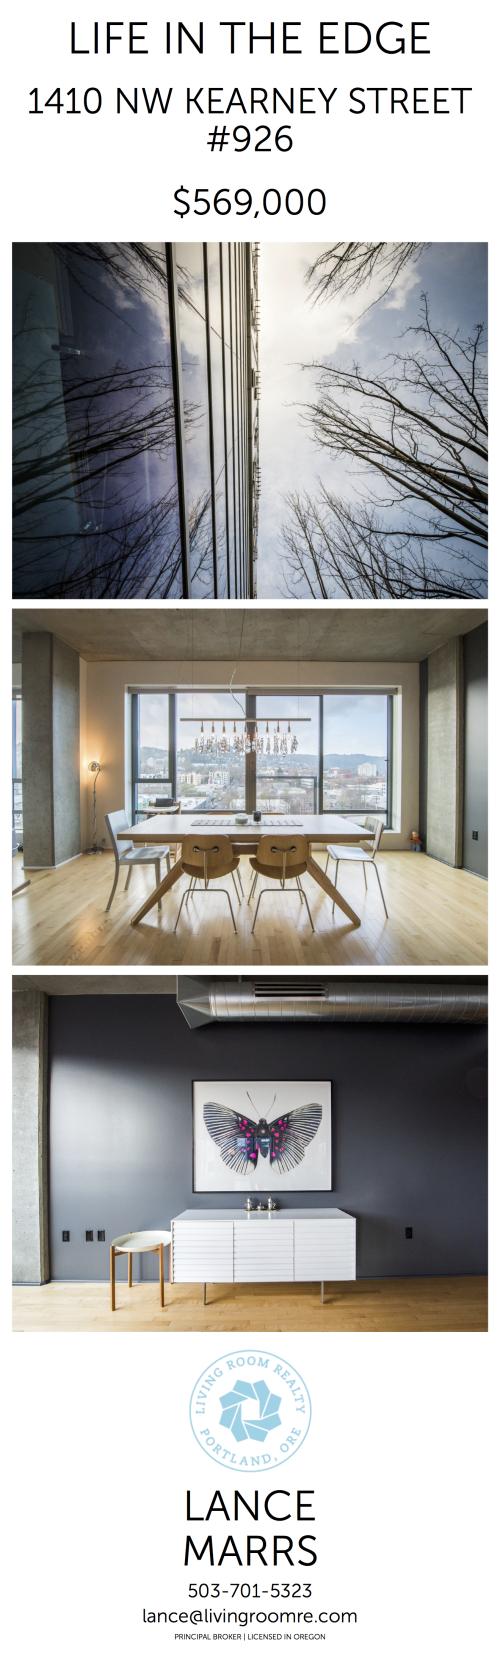 Lance_PortlandArchitecture_Ad_2017